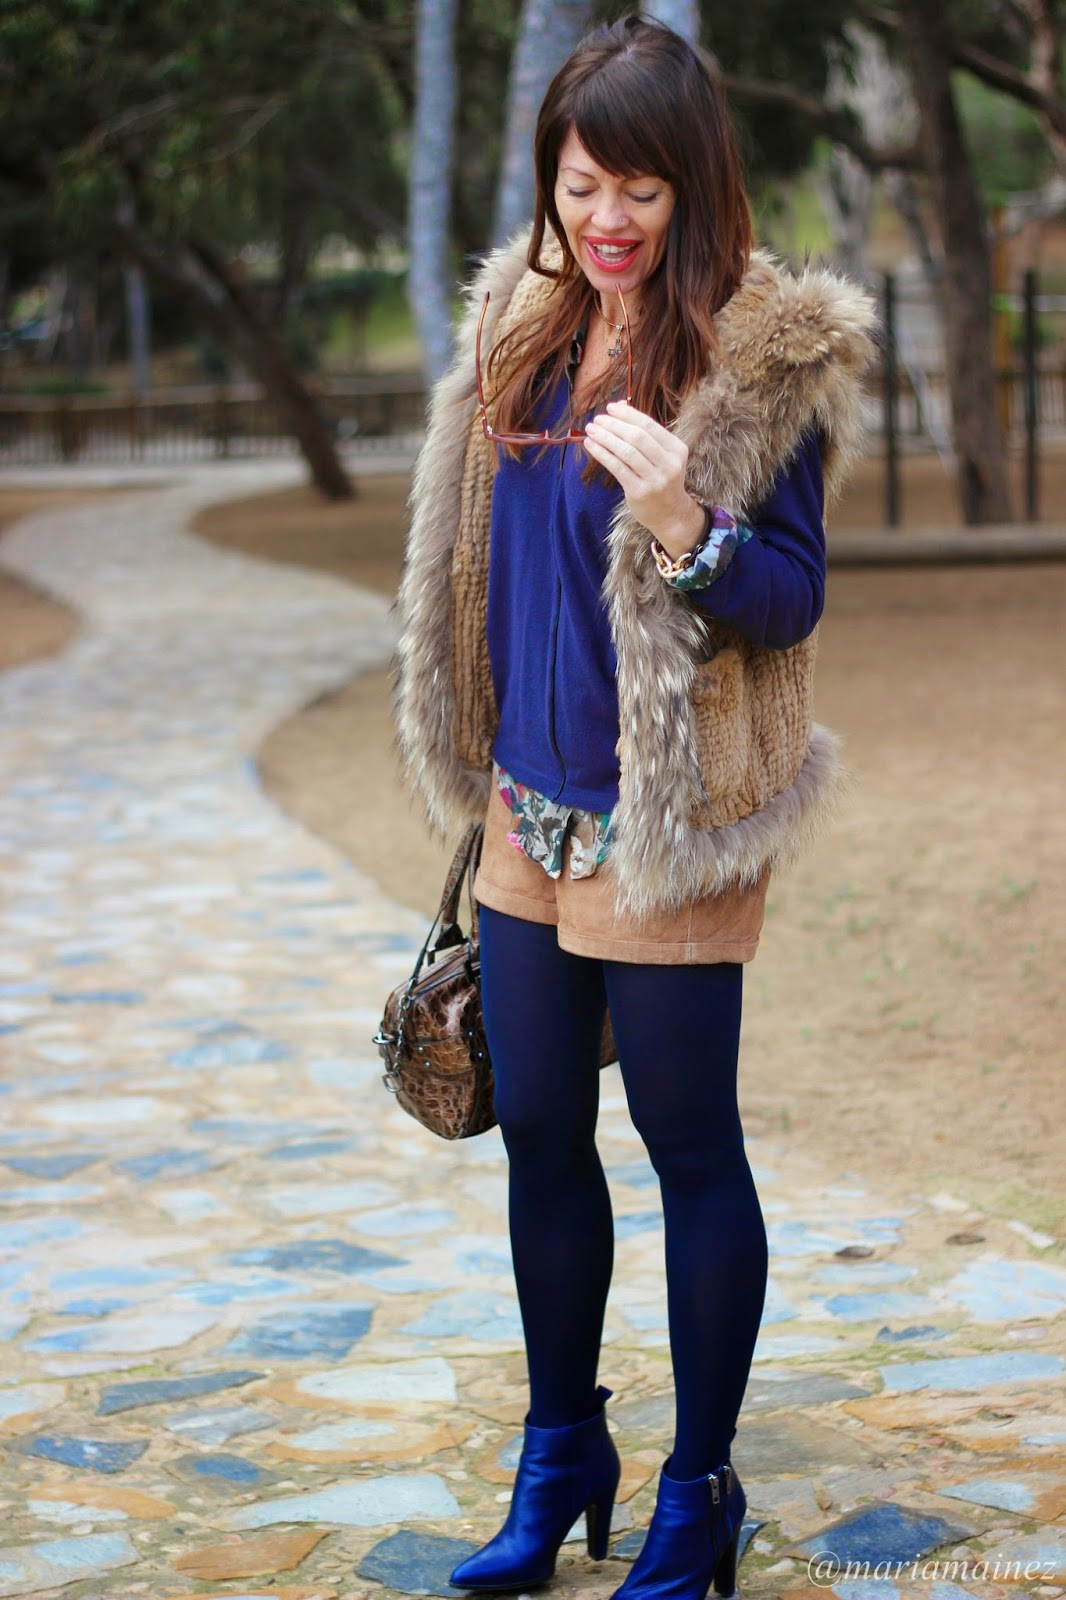 Fur Vest - Streetstyle - Fashion Blogger - BBeautifulbymaria